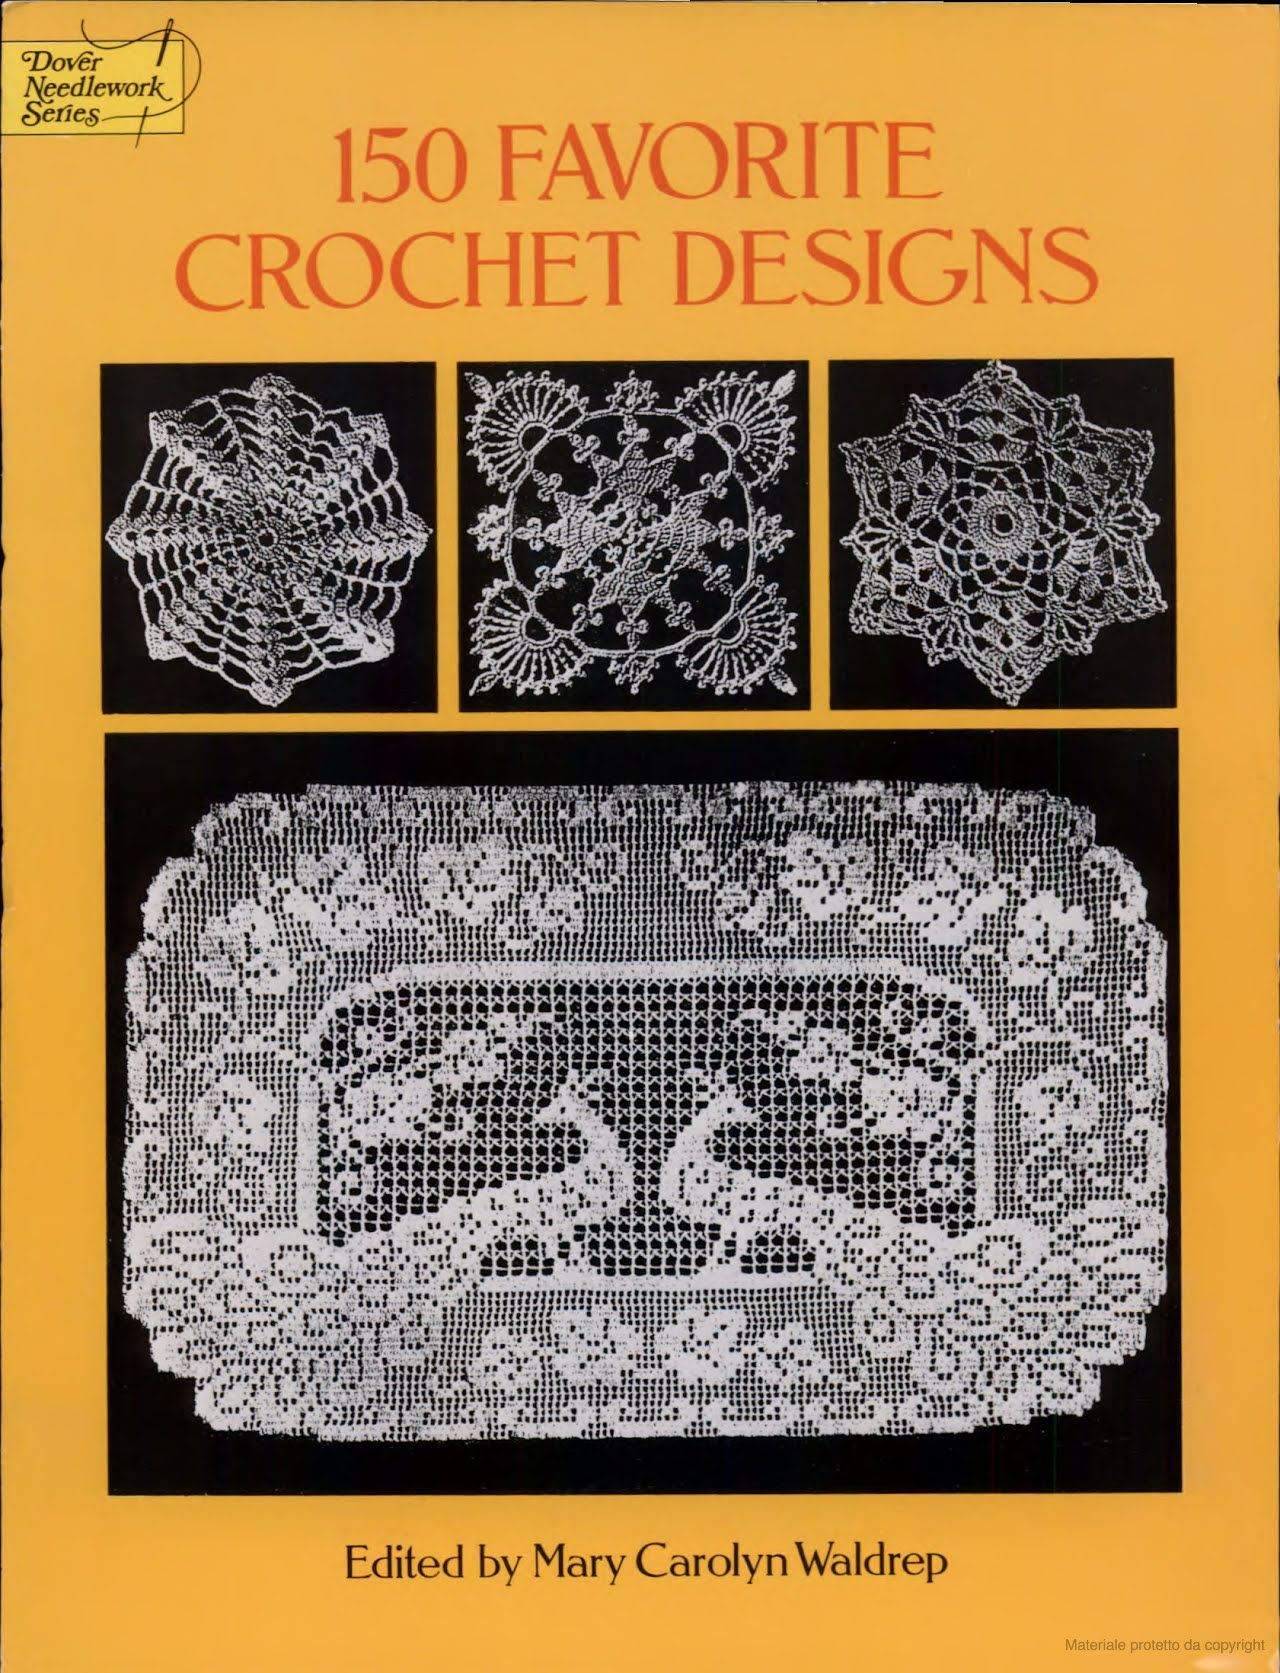 150 Favorite Crochet Designs   Crochet Ideas   Pinterest   Crochet mobile,  Cell phone pouch and Crochet